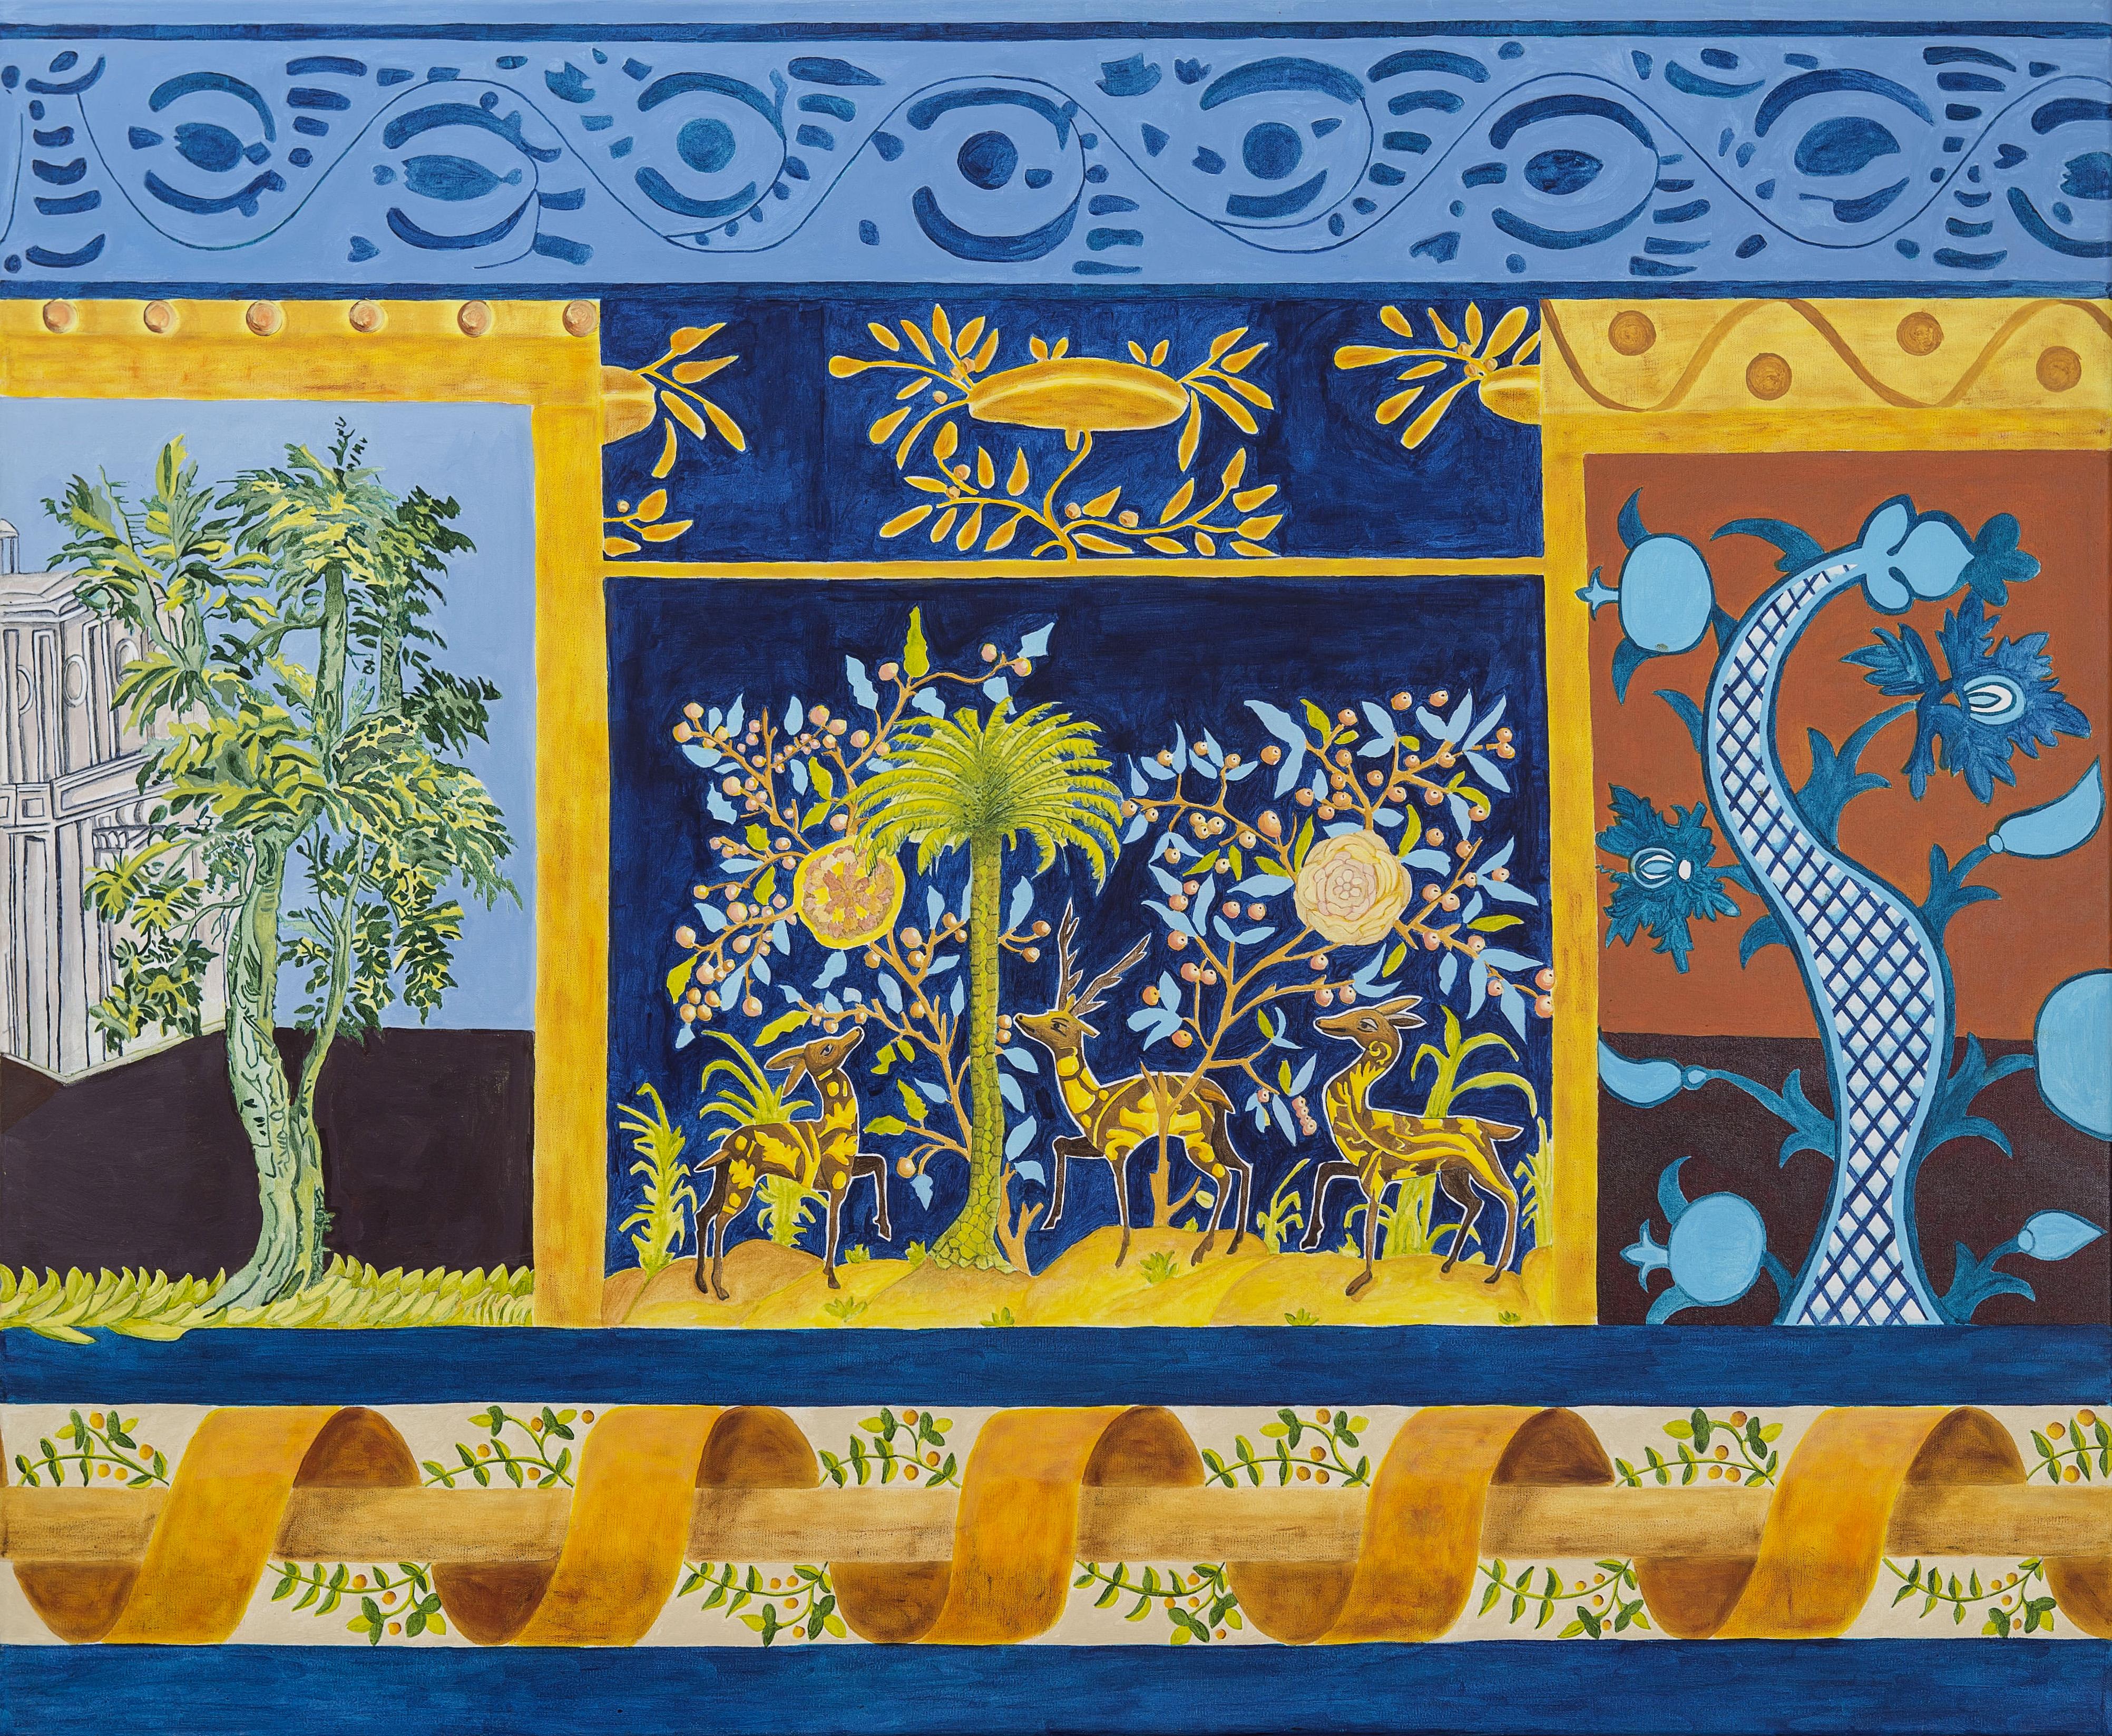 D Painting Exhibition In Dubai : For the diary portuguese art exhibition in dubai a e